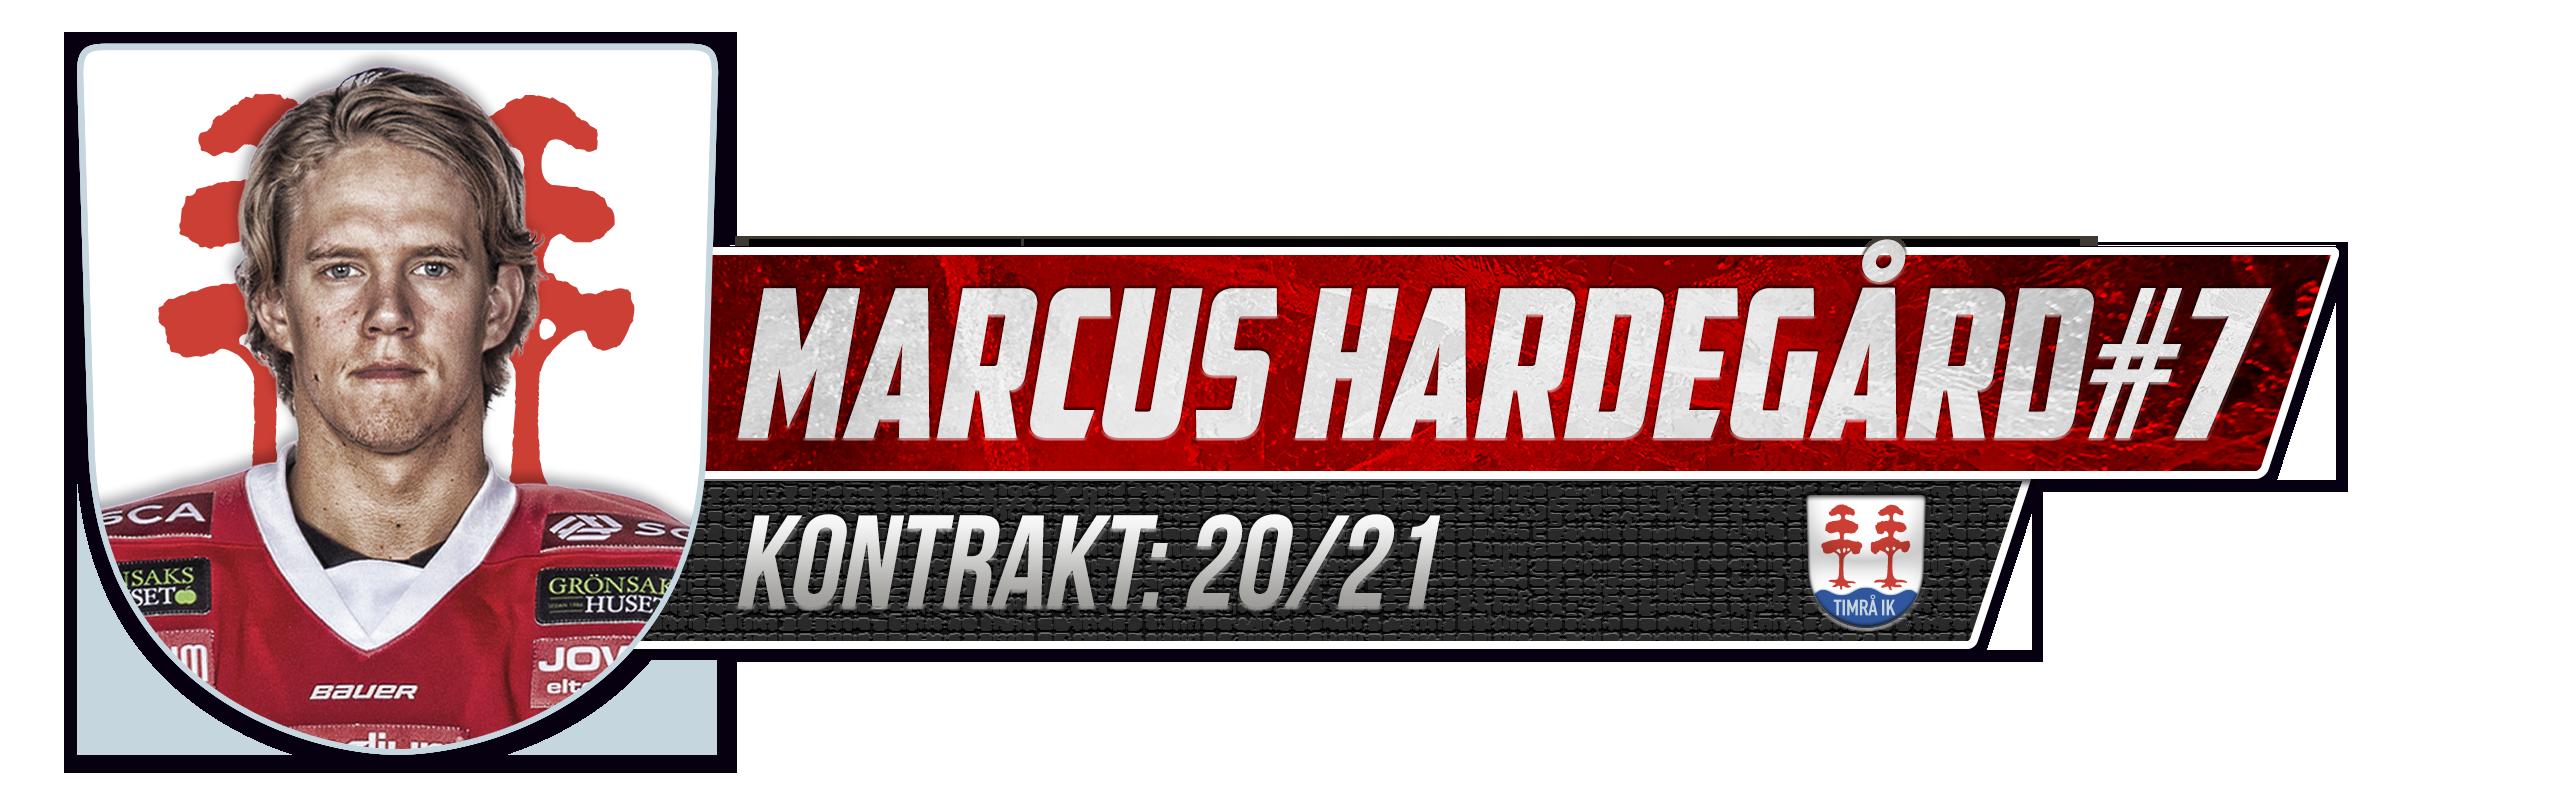 Marcus Hardegård